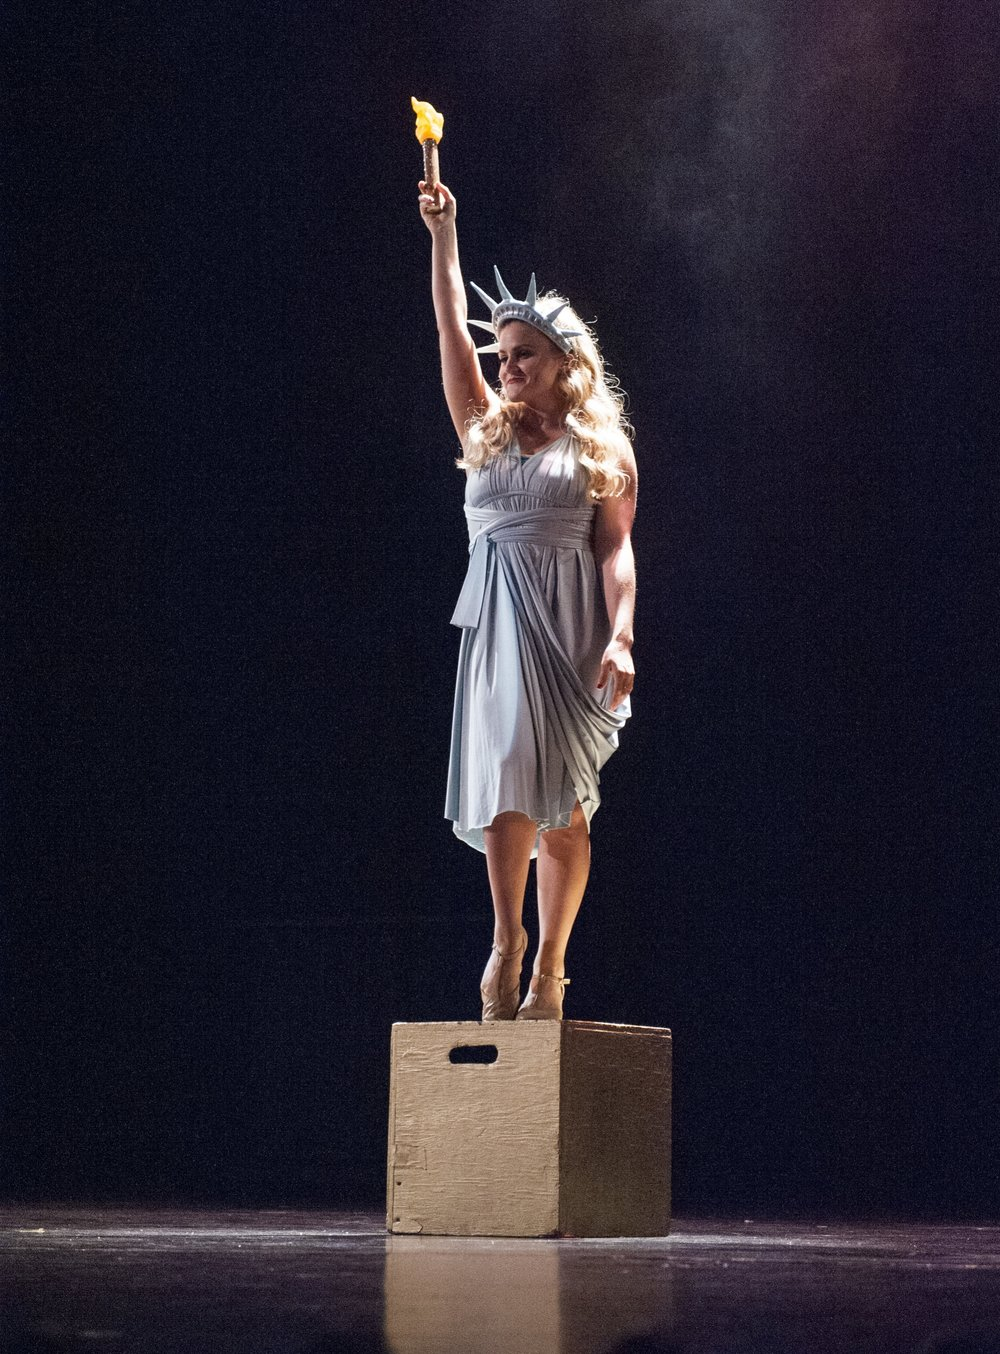 Danza-TheLastBite-Performance14.JPG